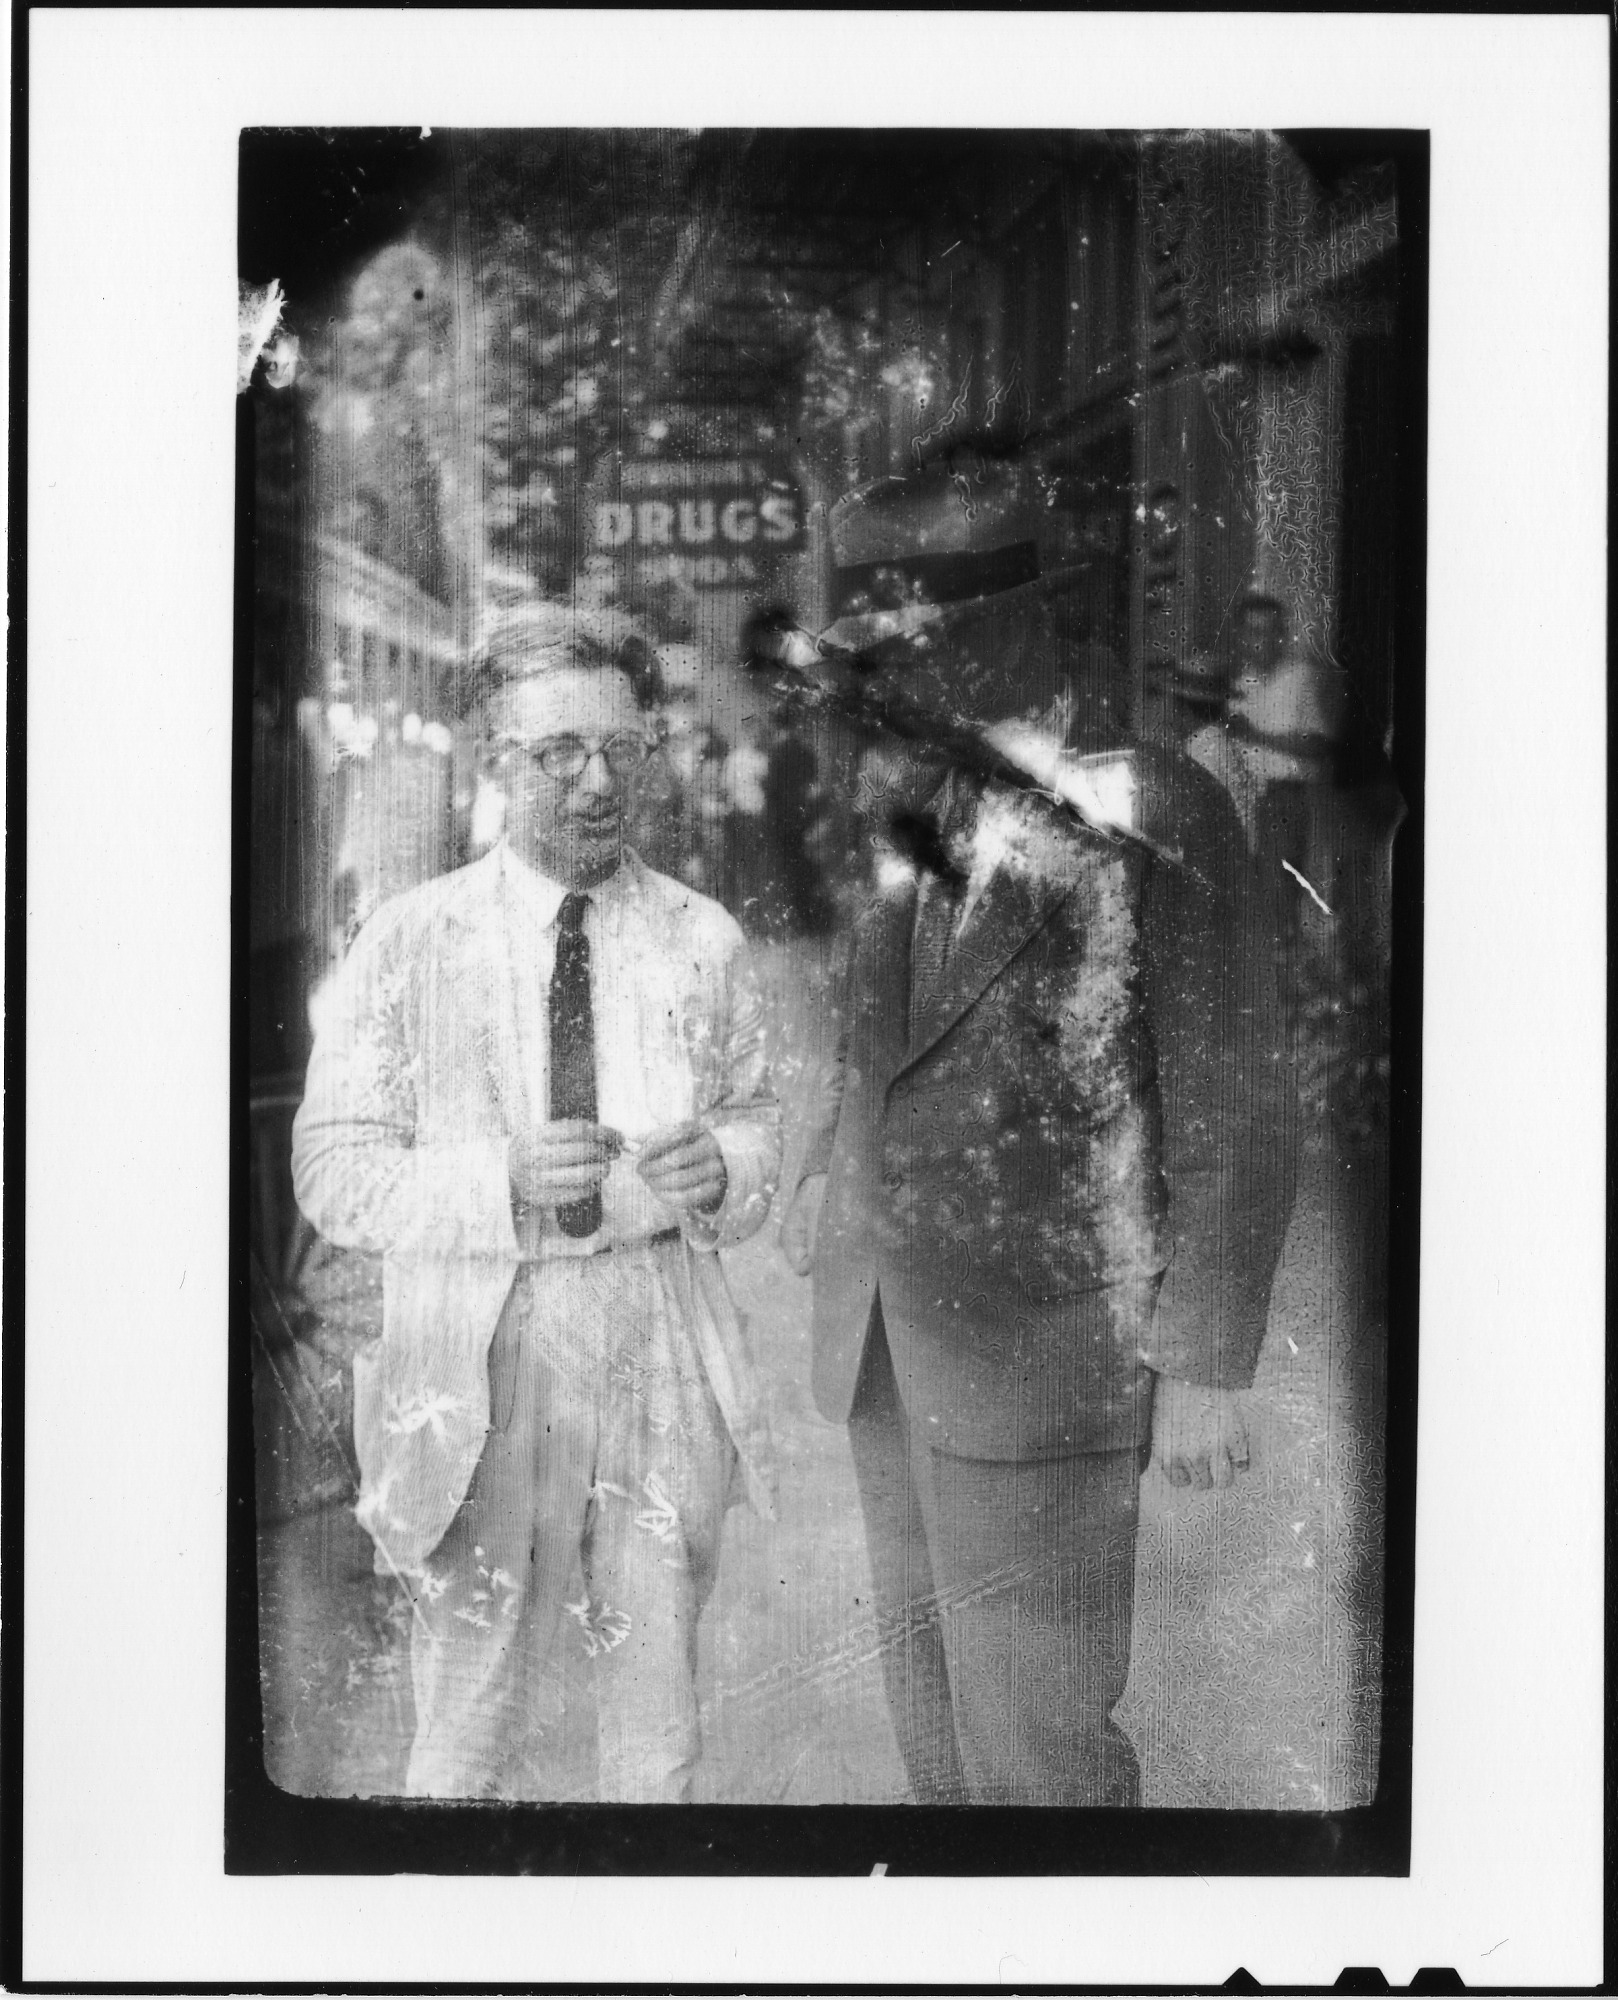 George Washington Rappleyea (left) with unidentified man